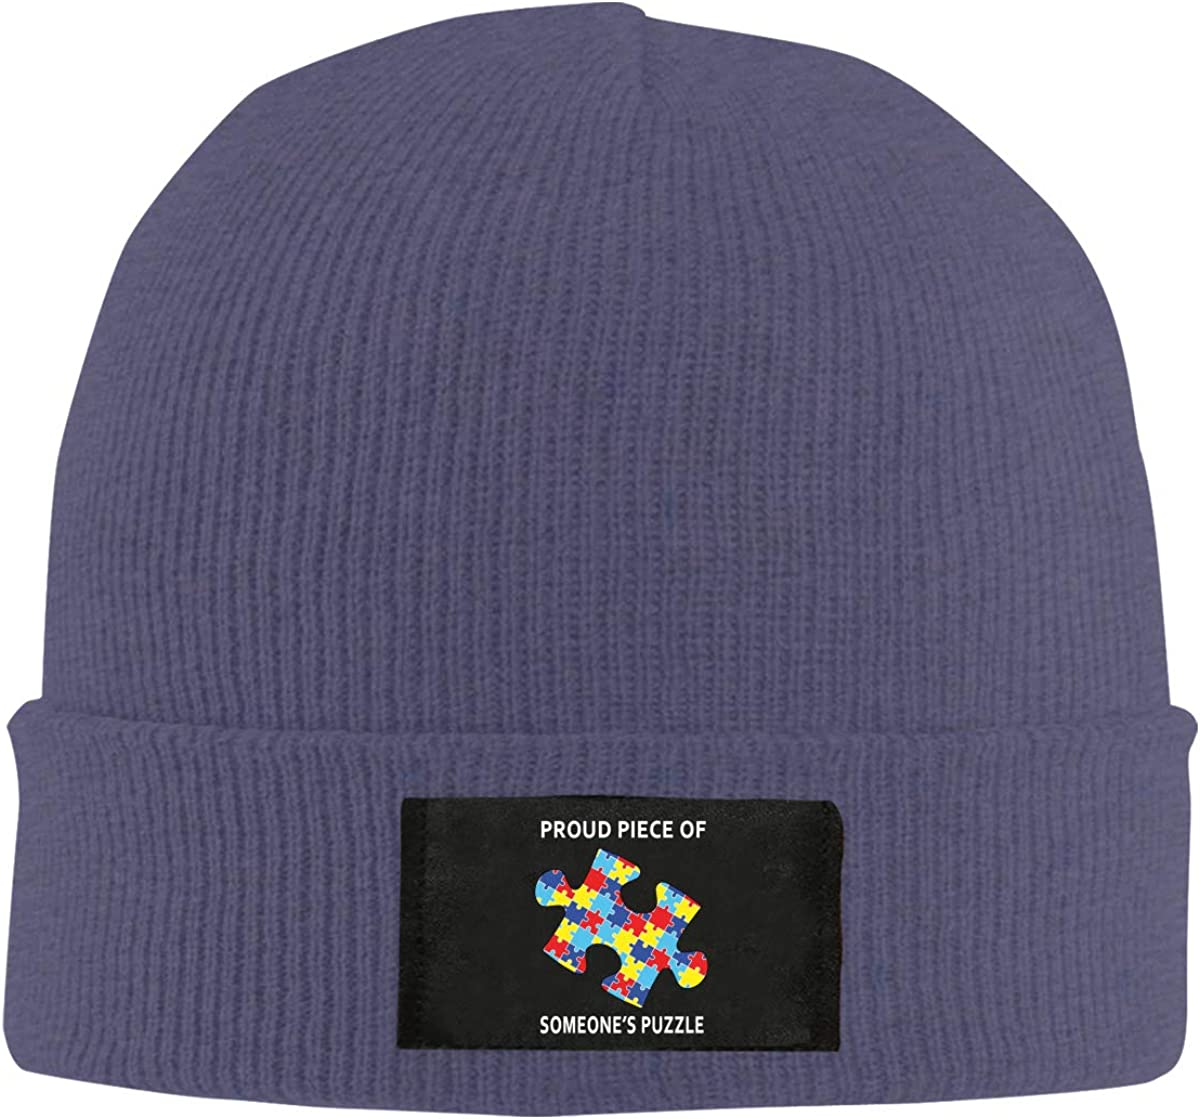 Proud Piece of Someones Puzzle Top Level Beanie Men Women Unisex Stylish Slouch Beanie Hats Black